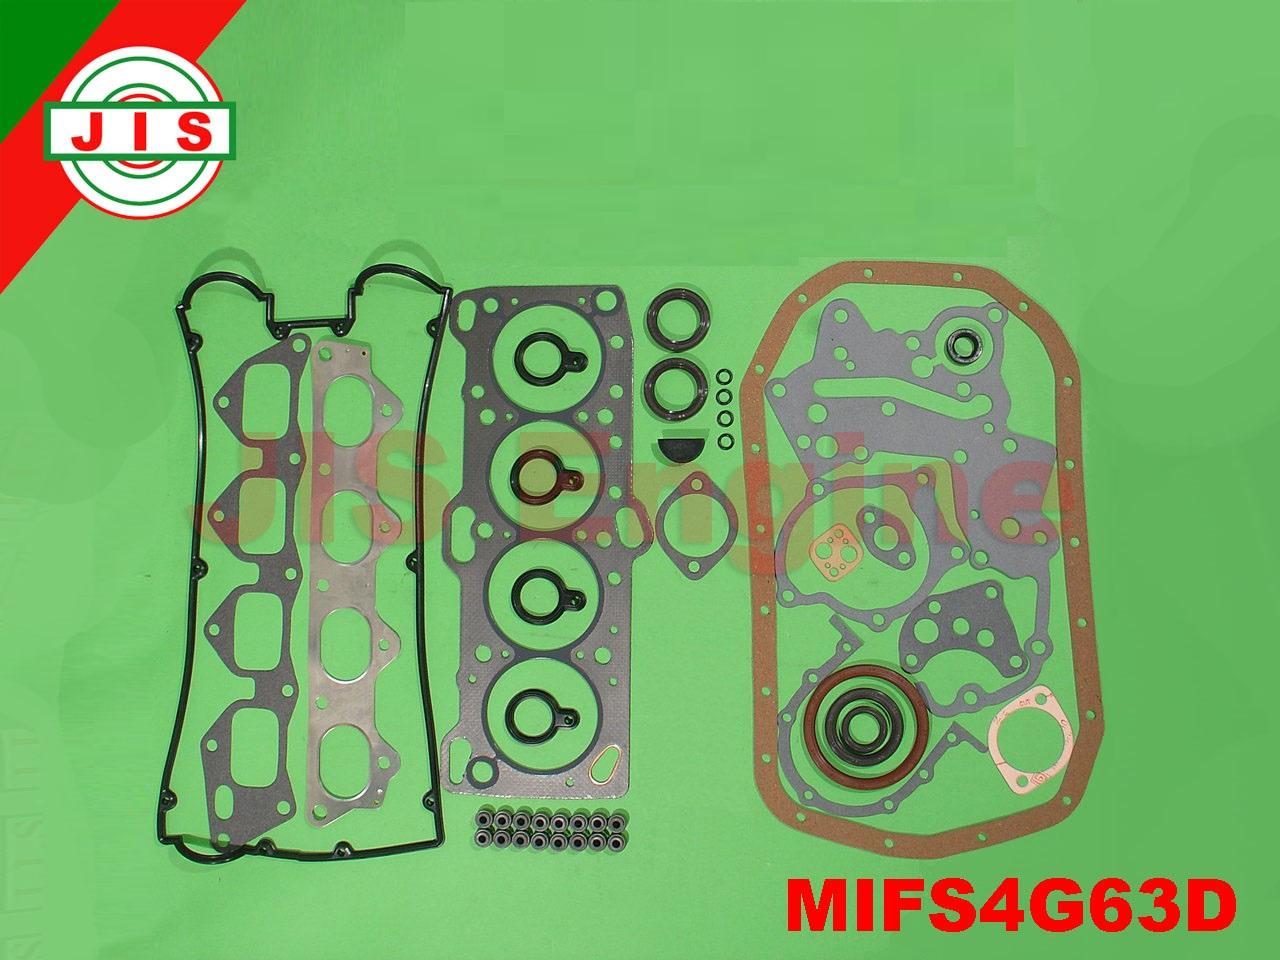 Misubishi 89 92 Eclipse 4g63 Full Gasket Set MIFS4G63D